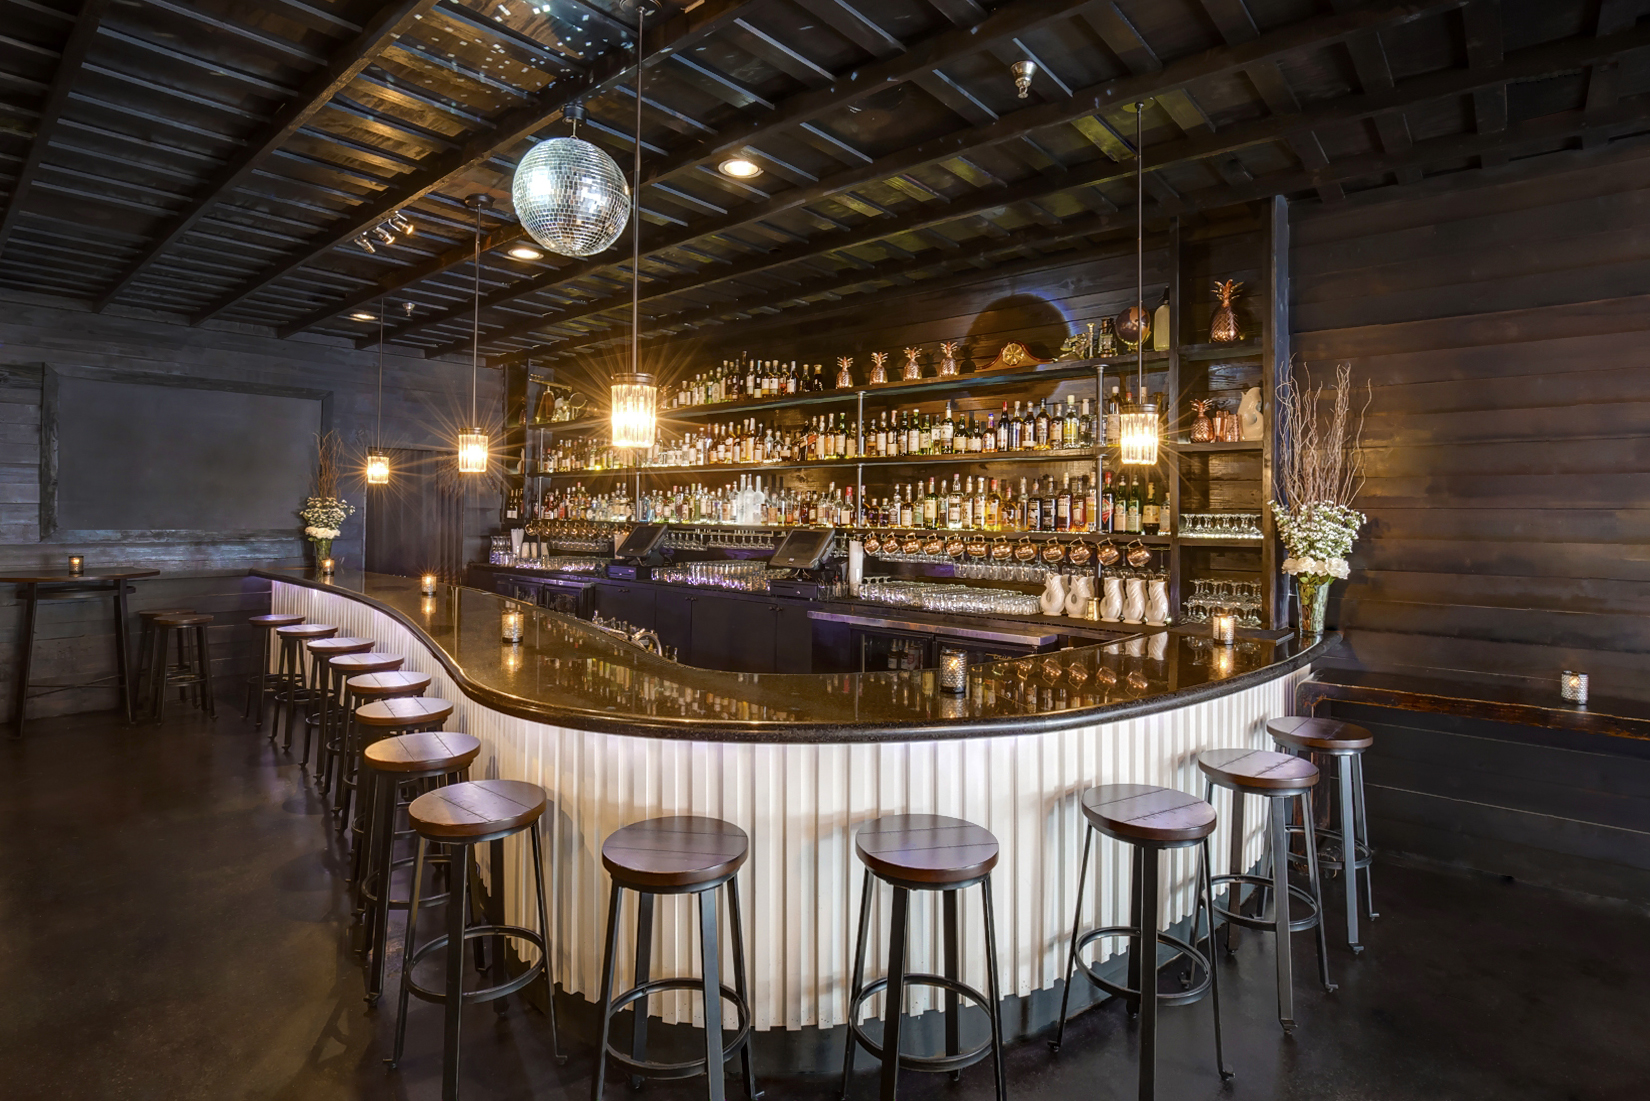 Eleanor Downstairs Bar #1 (Day).jpg